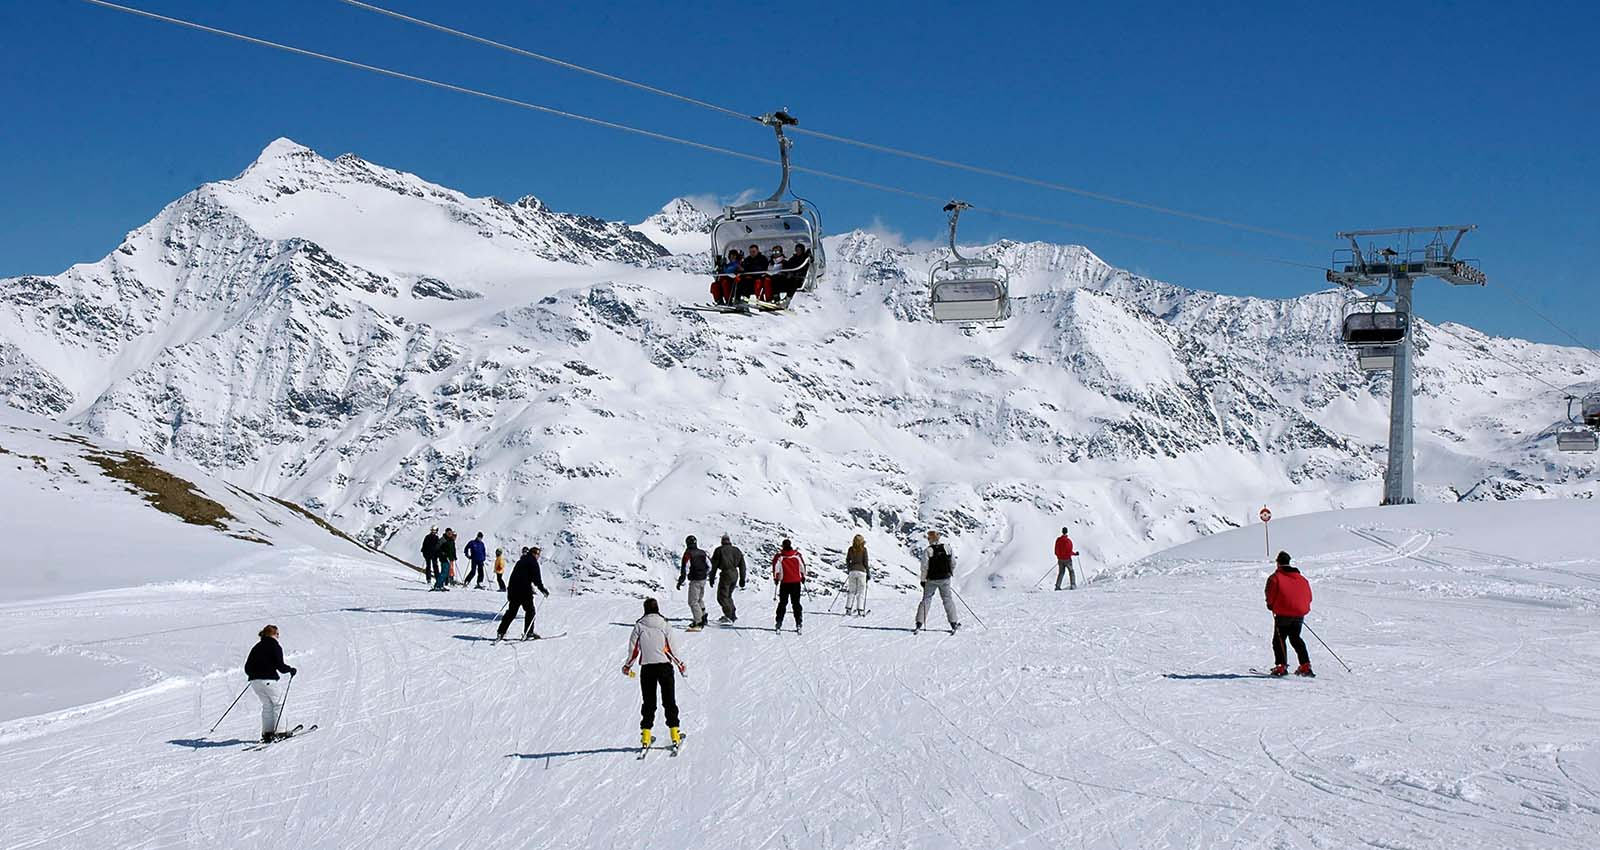 school ski trips to italy